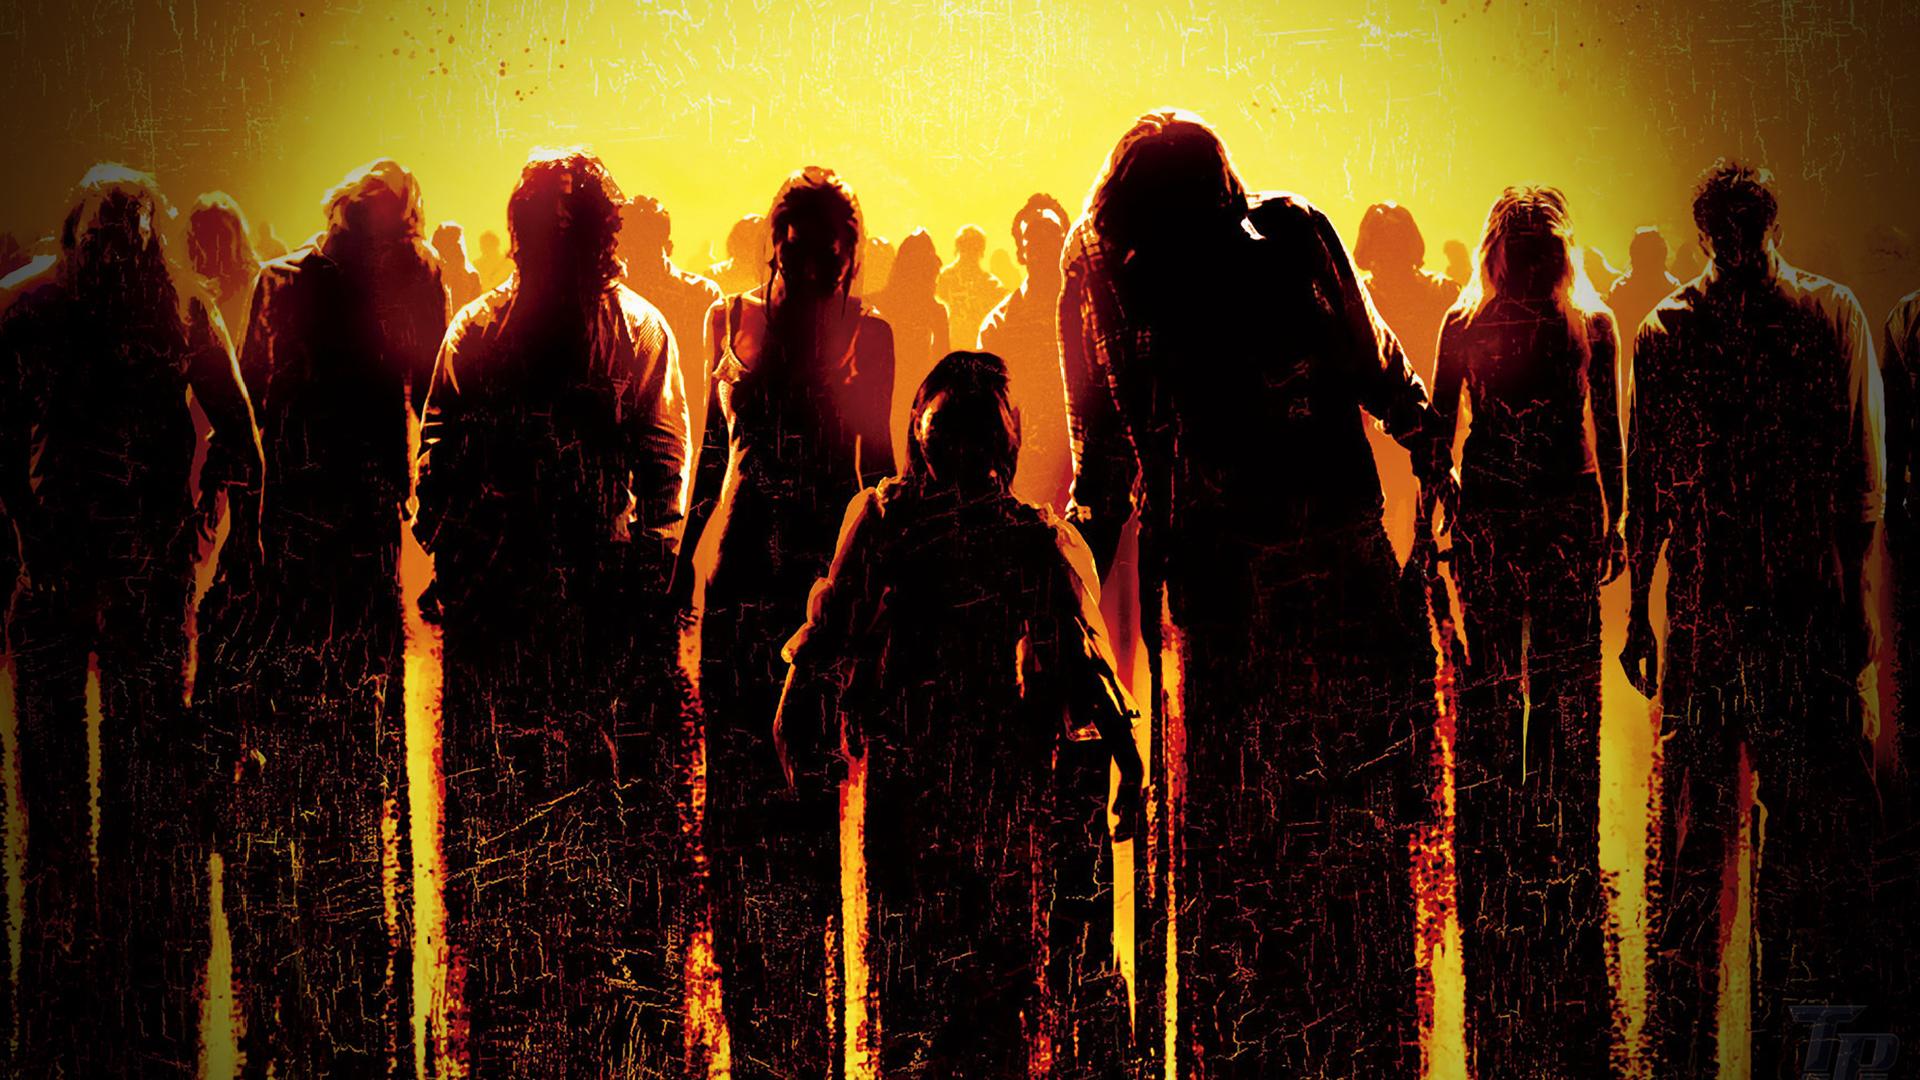 Top 10 Horrorfilm-remakes (sinds 2000)